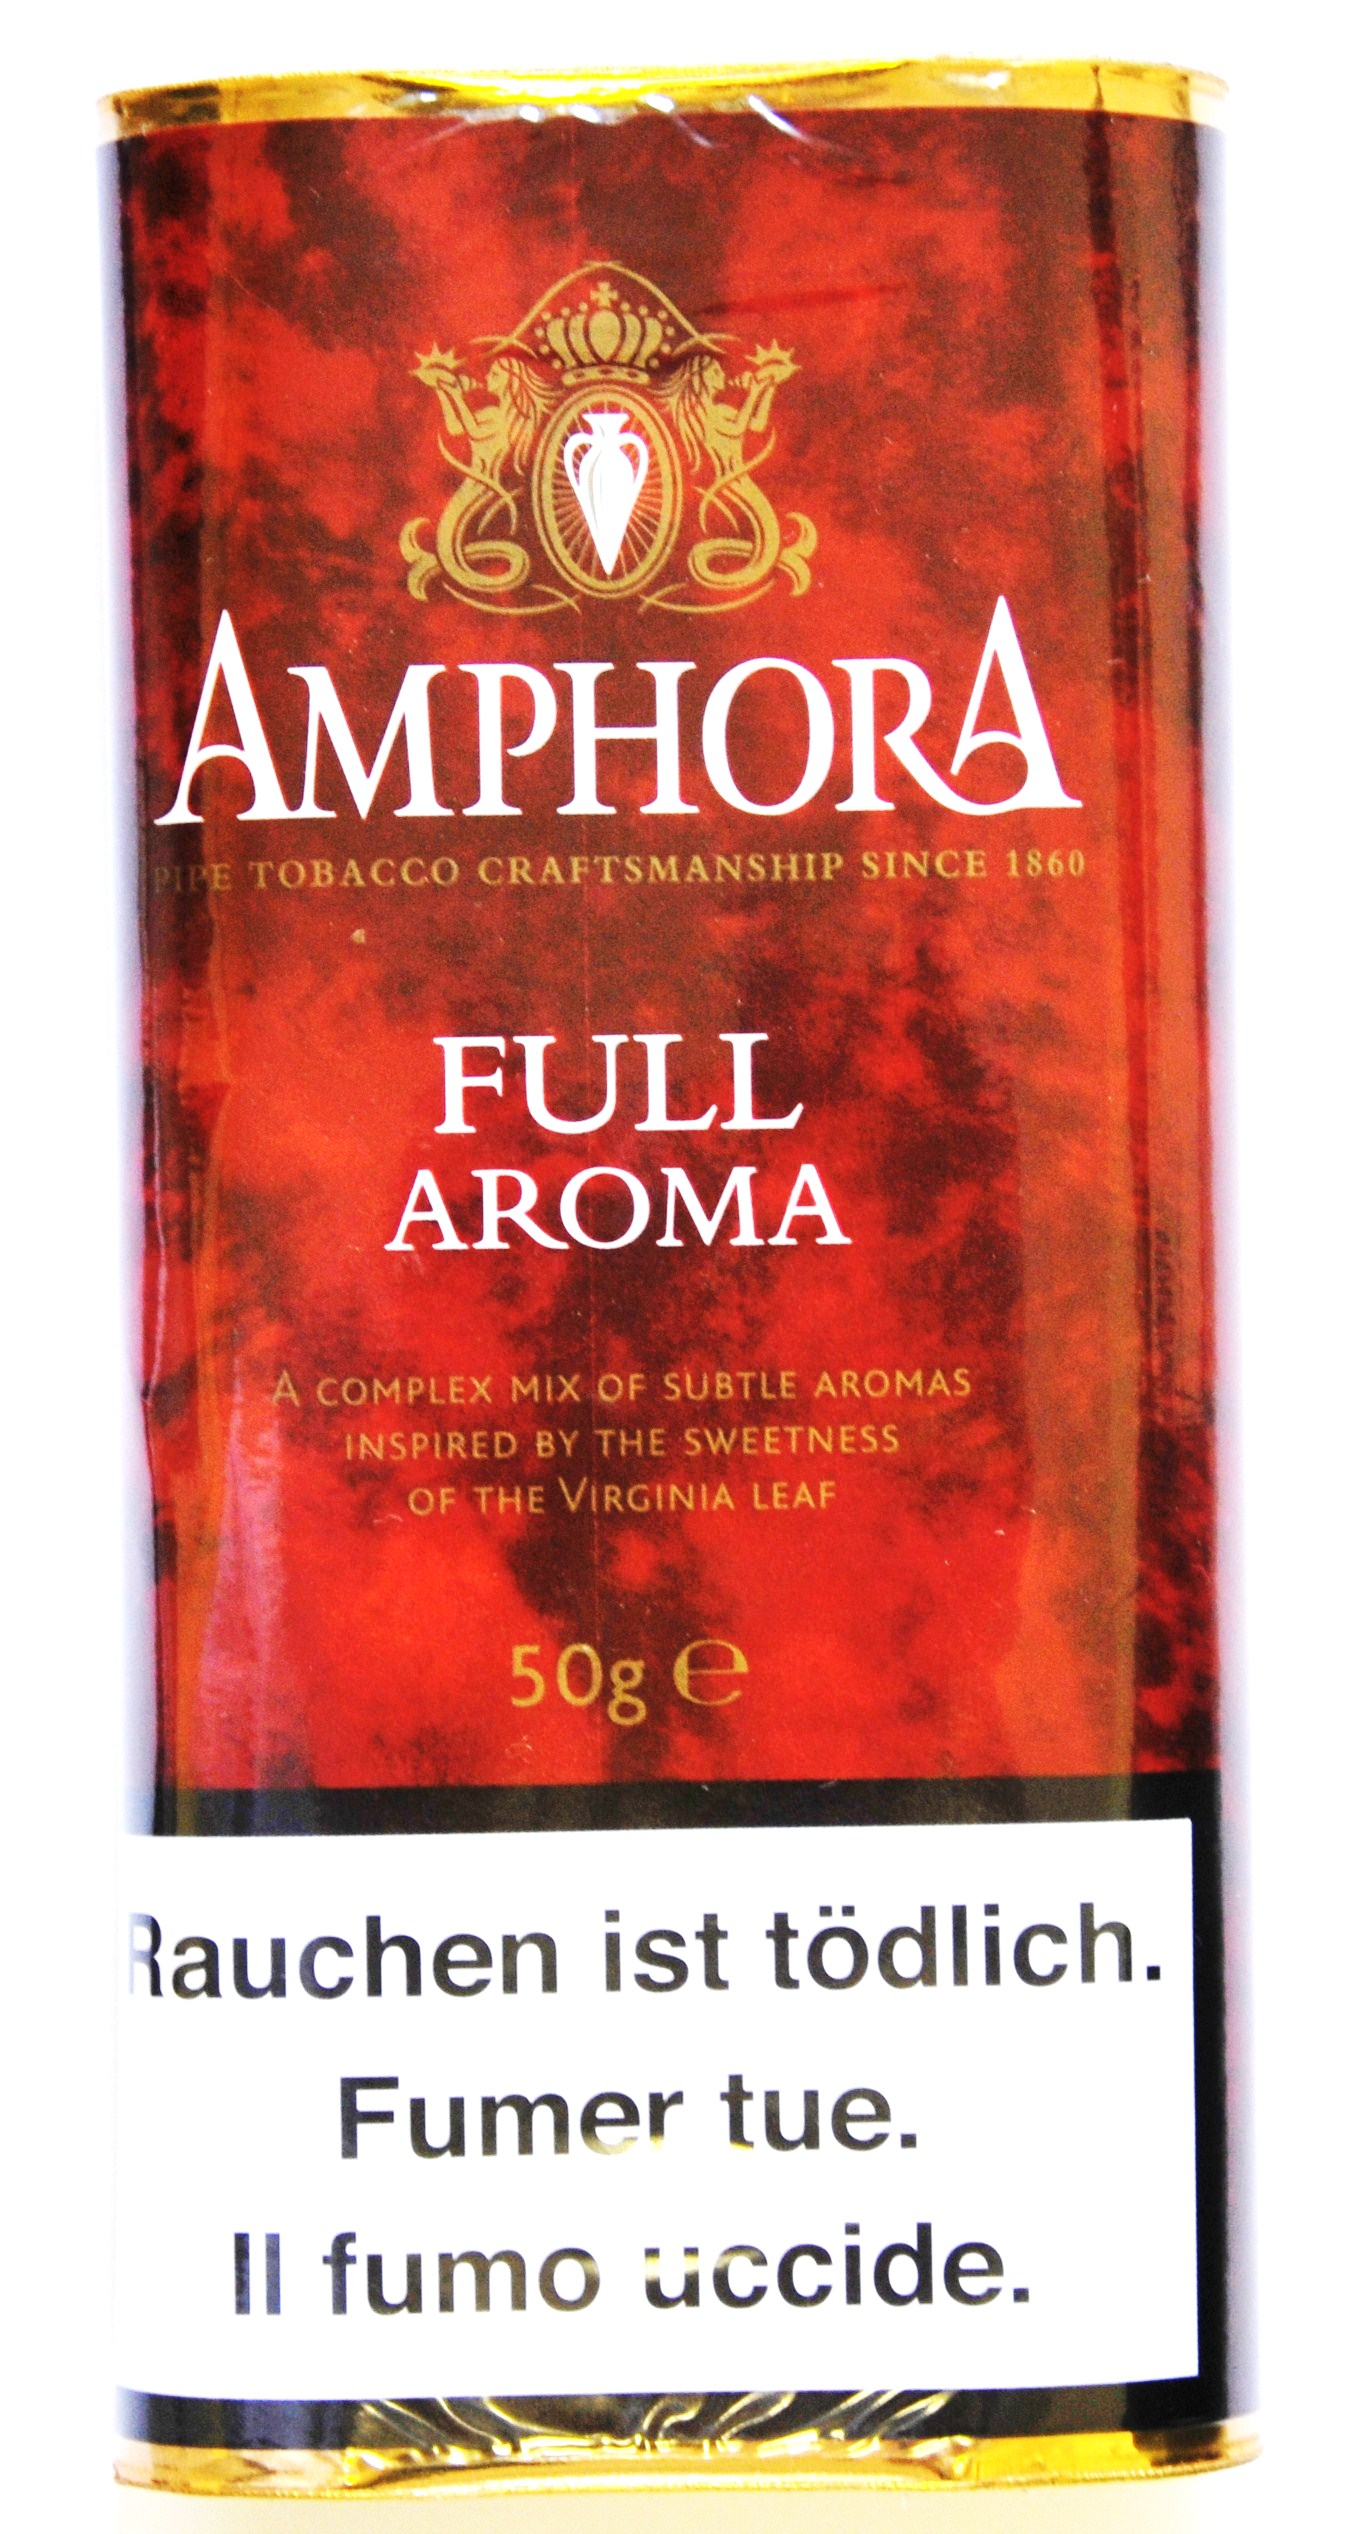 Amphora full aroma.jpg